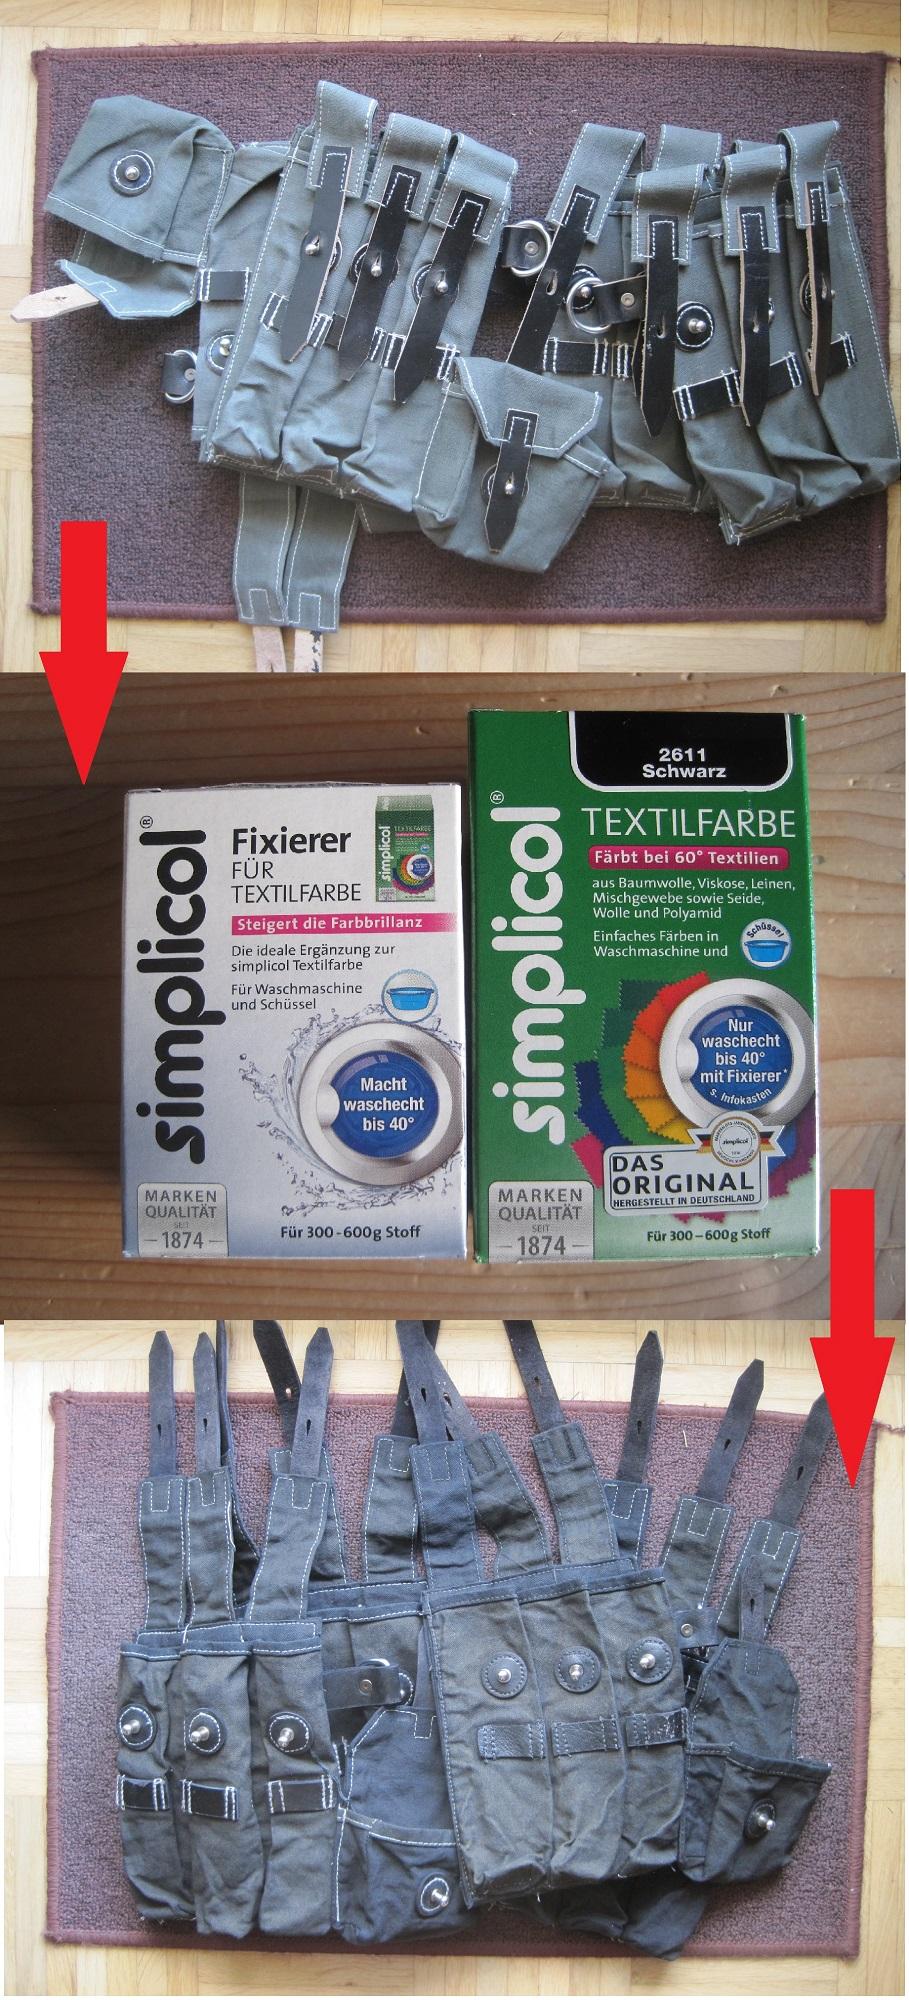 fs5.directupload.net/images/160721/r94j33si.jpg